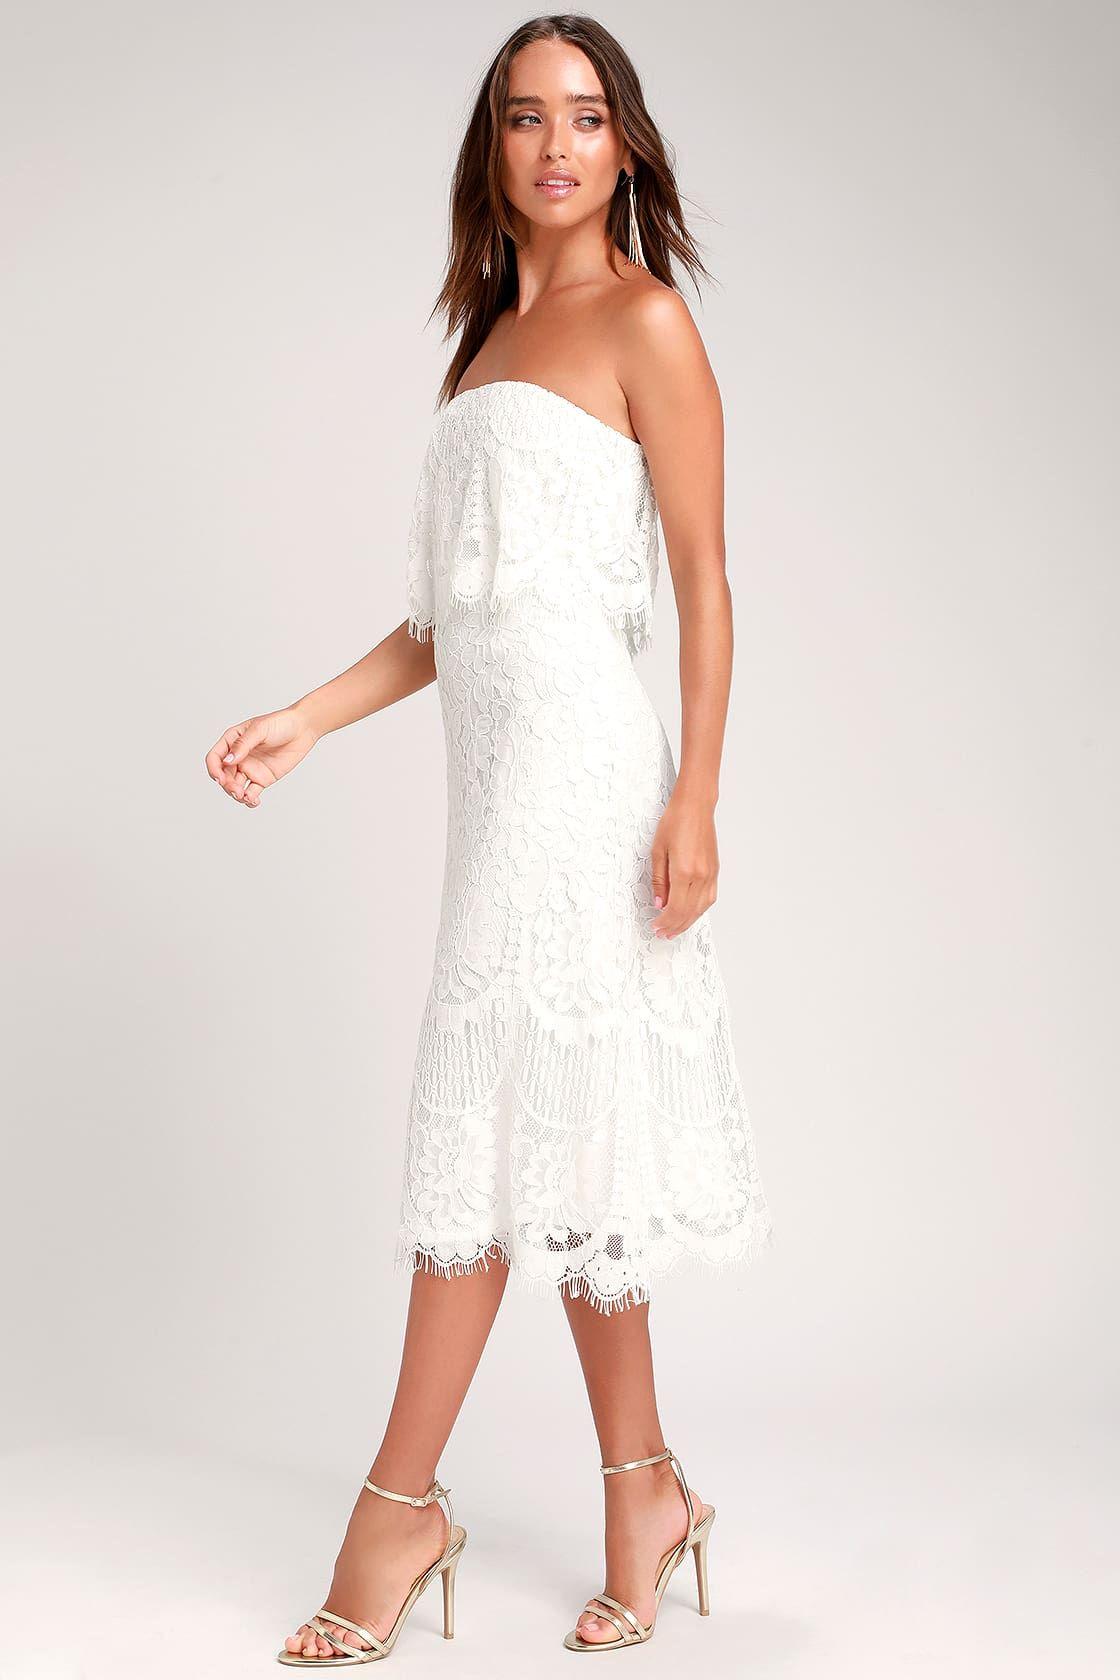 Delia White Lace Strapless Midi Dress Little White Dresses Long White Dress Strapless Midi Dress [ 1680 x 1120 Pixel ]